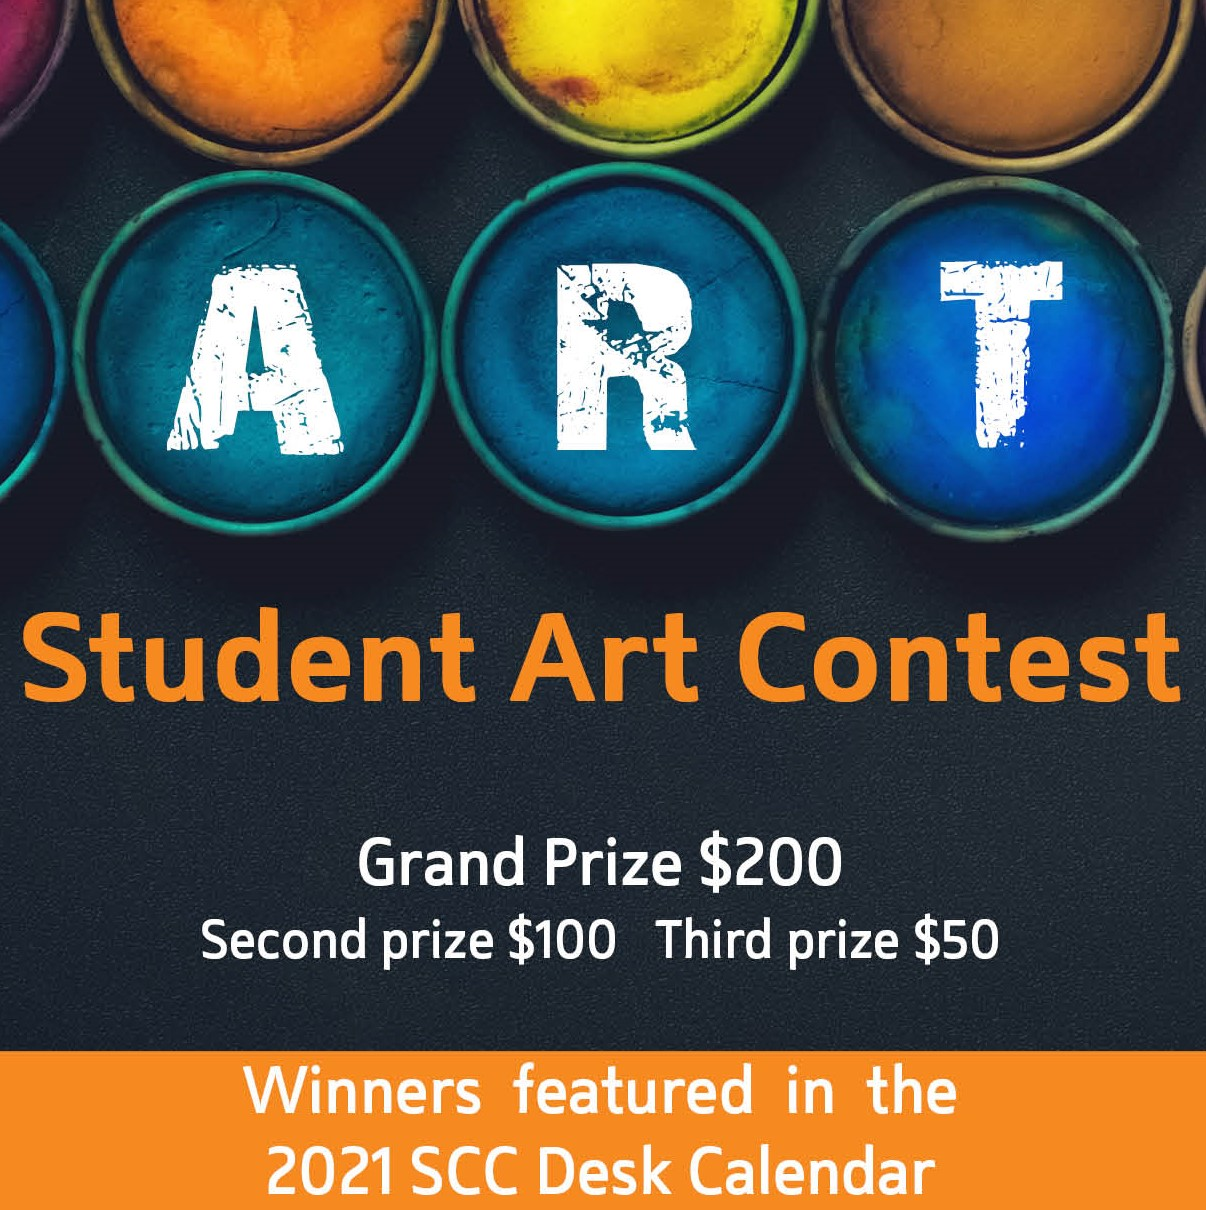 Scc Academic Calendar 2021 Southeastern | Student Art Contest